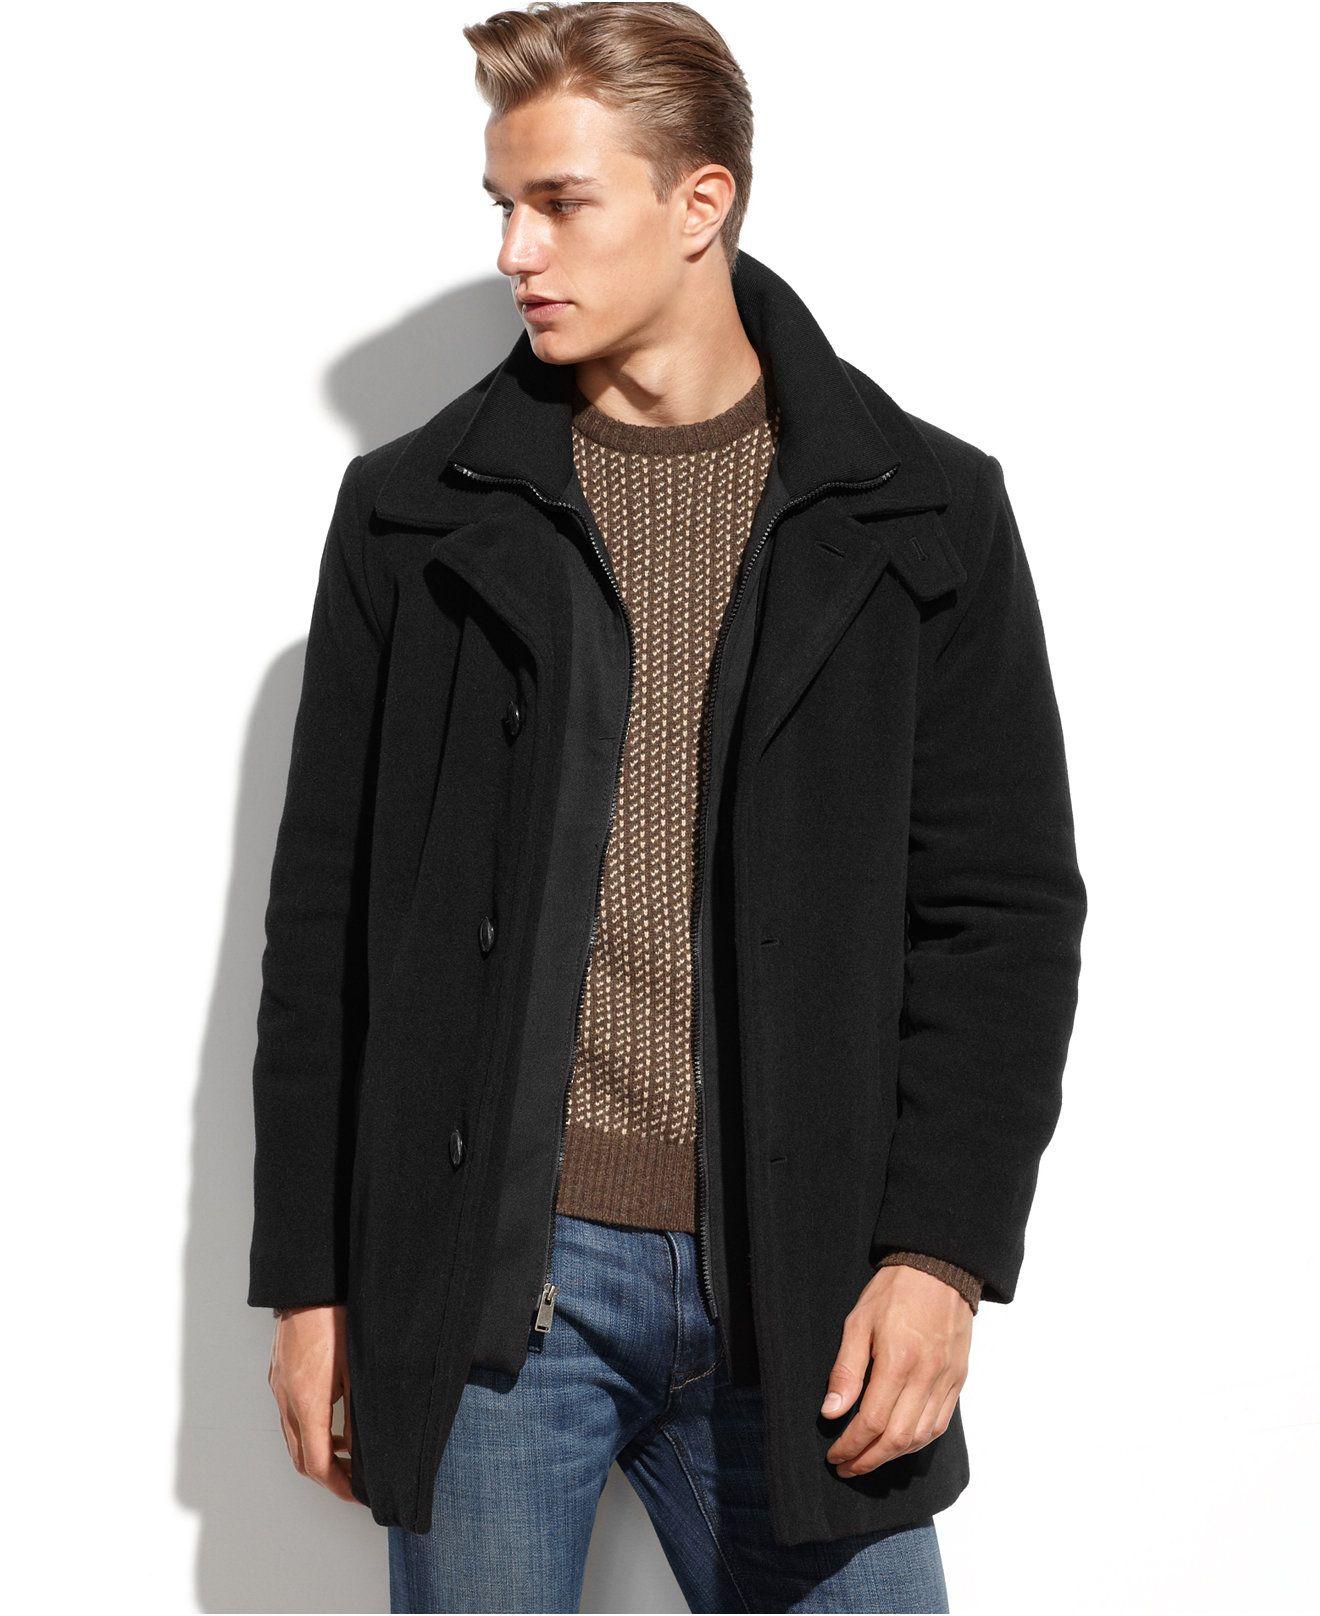 Calvin Klein Coleman Wool Blend Overcoat Reviews Coats Jackets Men Macy S Mens Street Style Mens Dressing Styles Casual Designer Clothes For Men [ 1616 x 1320 Pixel ]